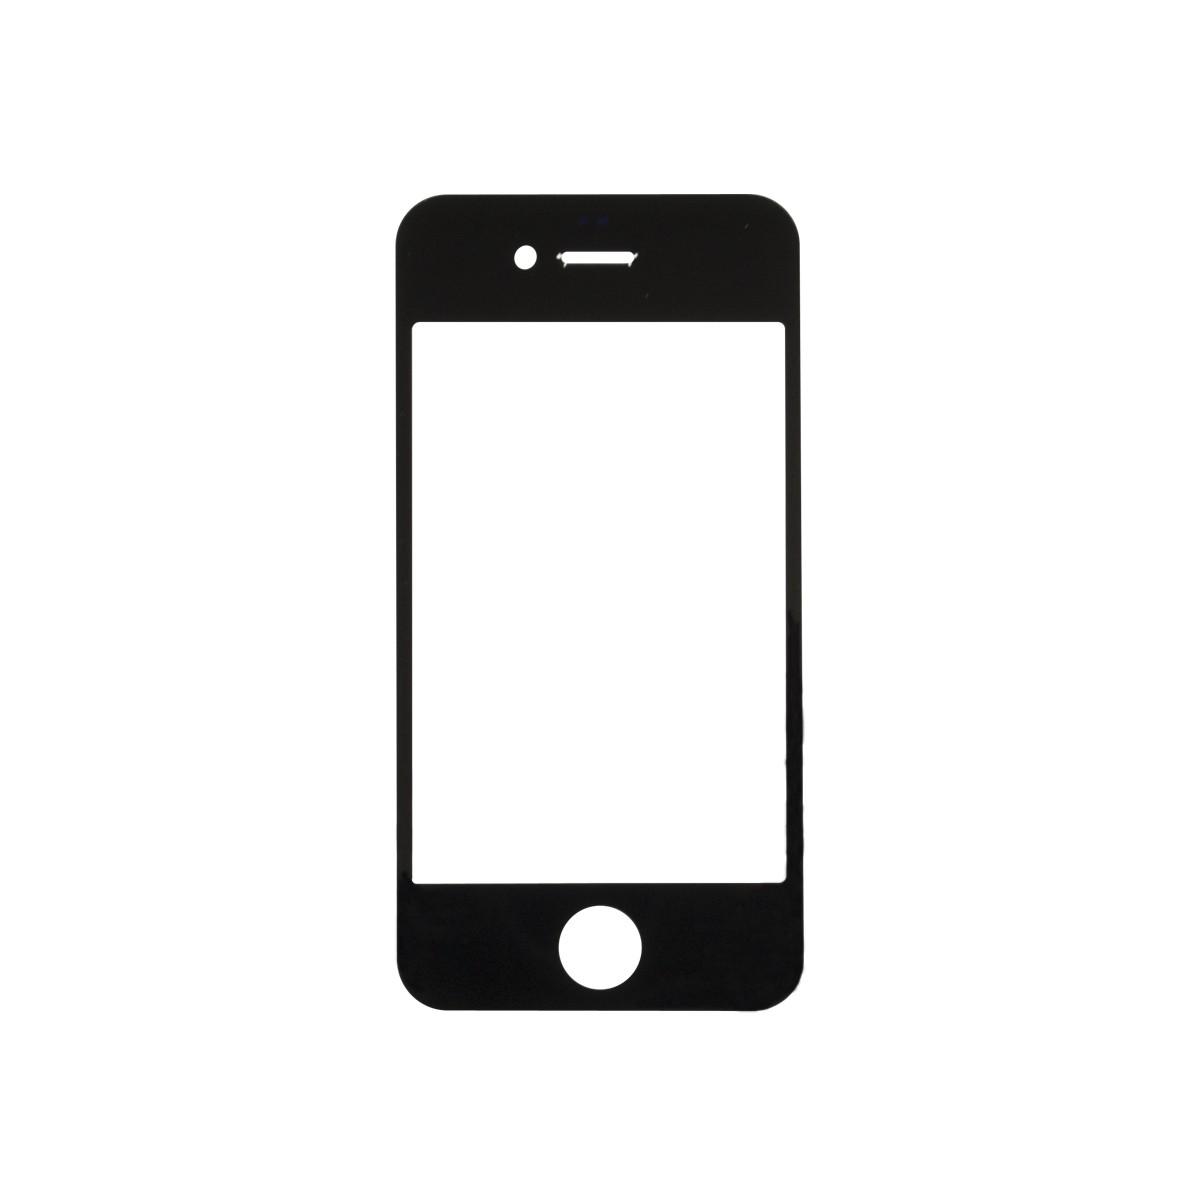 Iphone 4s Black Glass Lens Screen